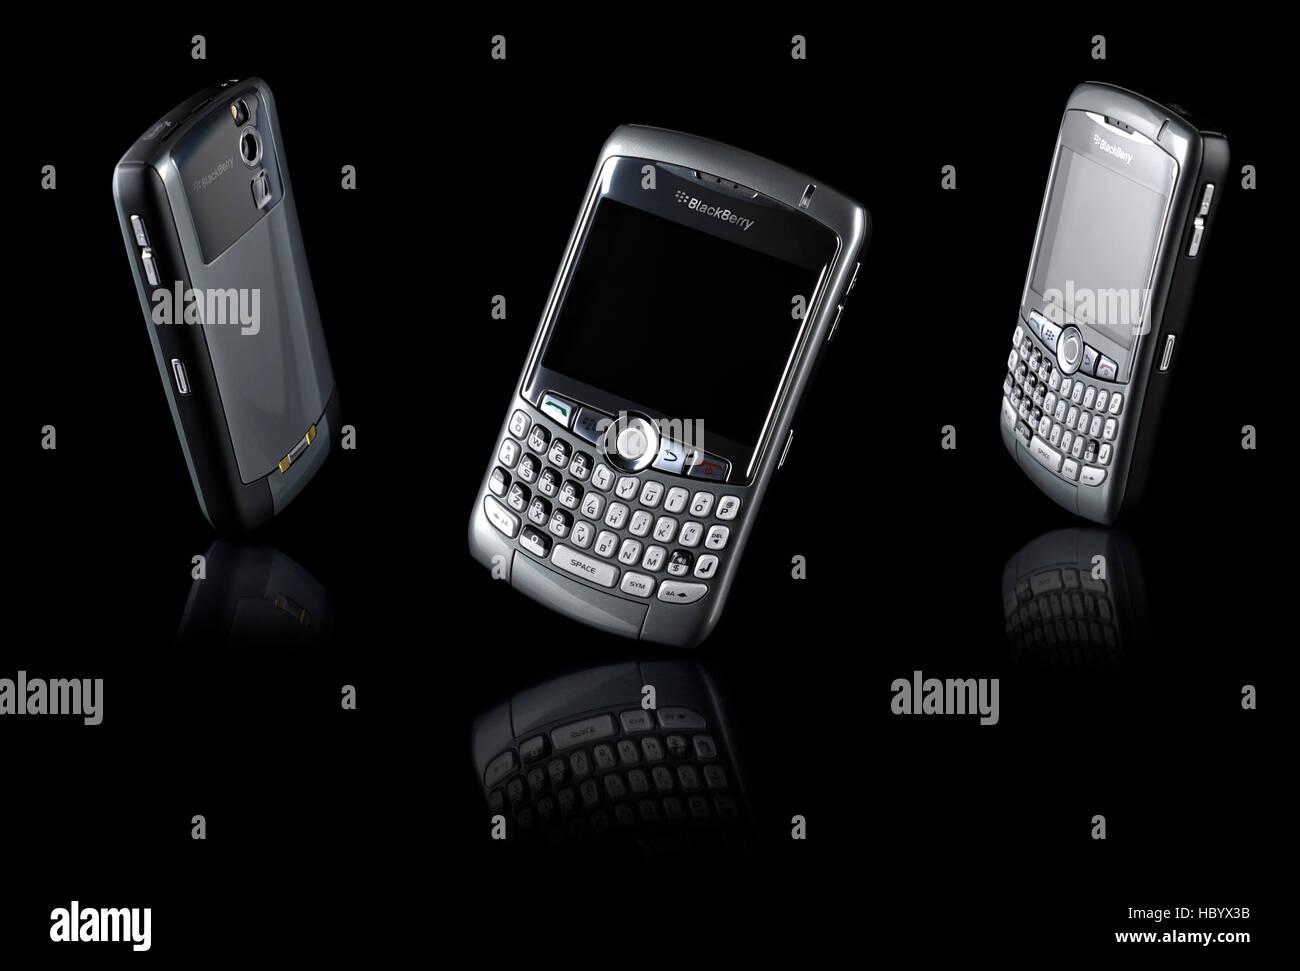 BlackBerry 8310 Curve, stylish smartphones - Stock Image